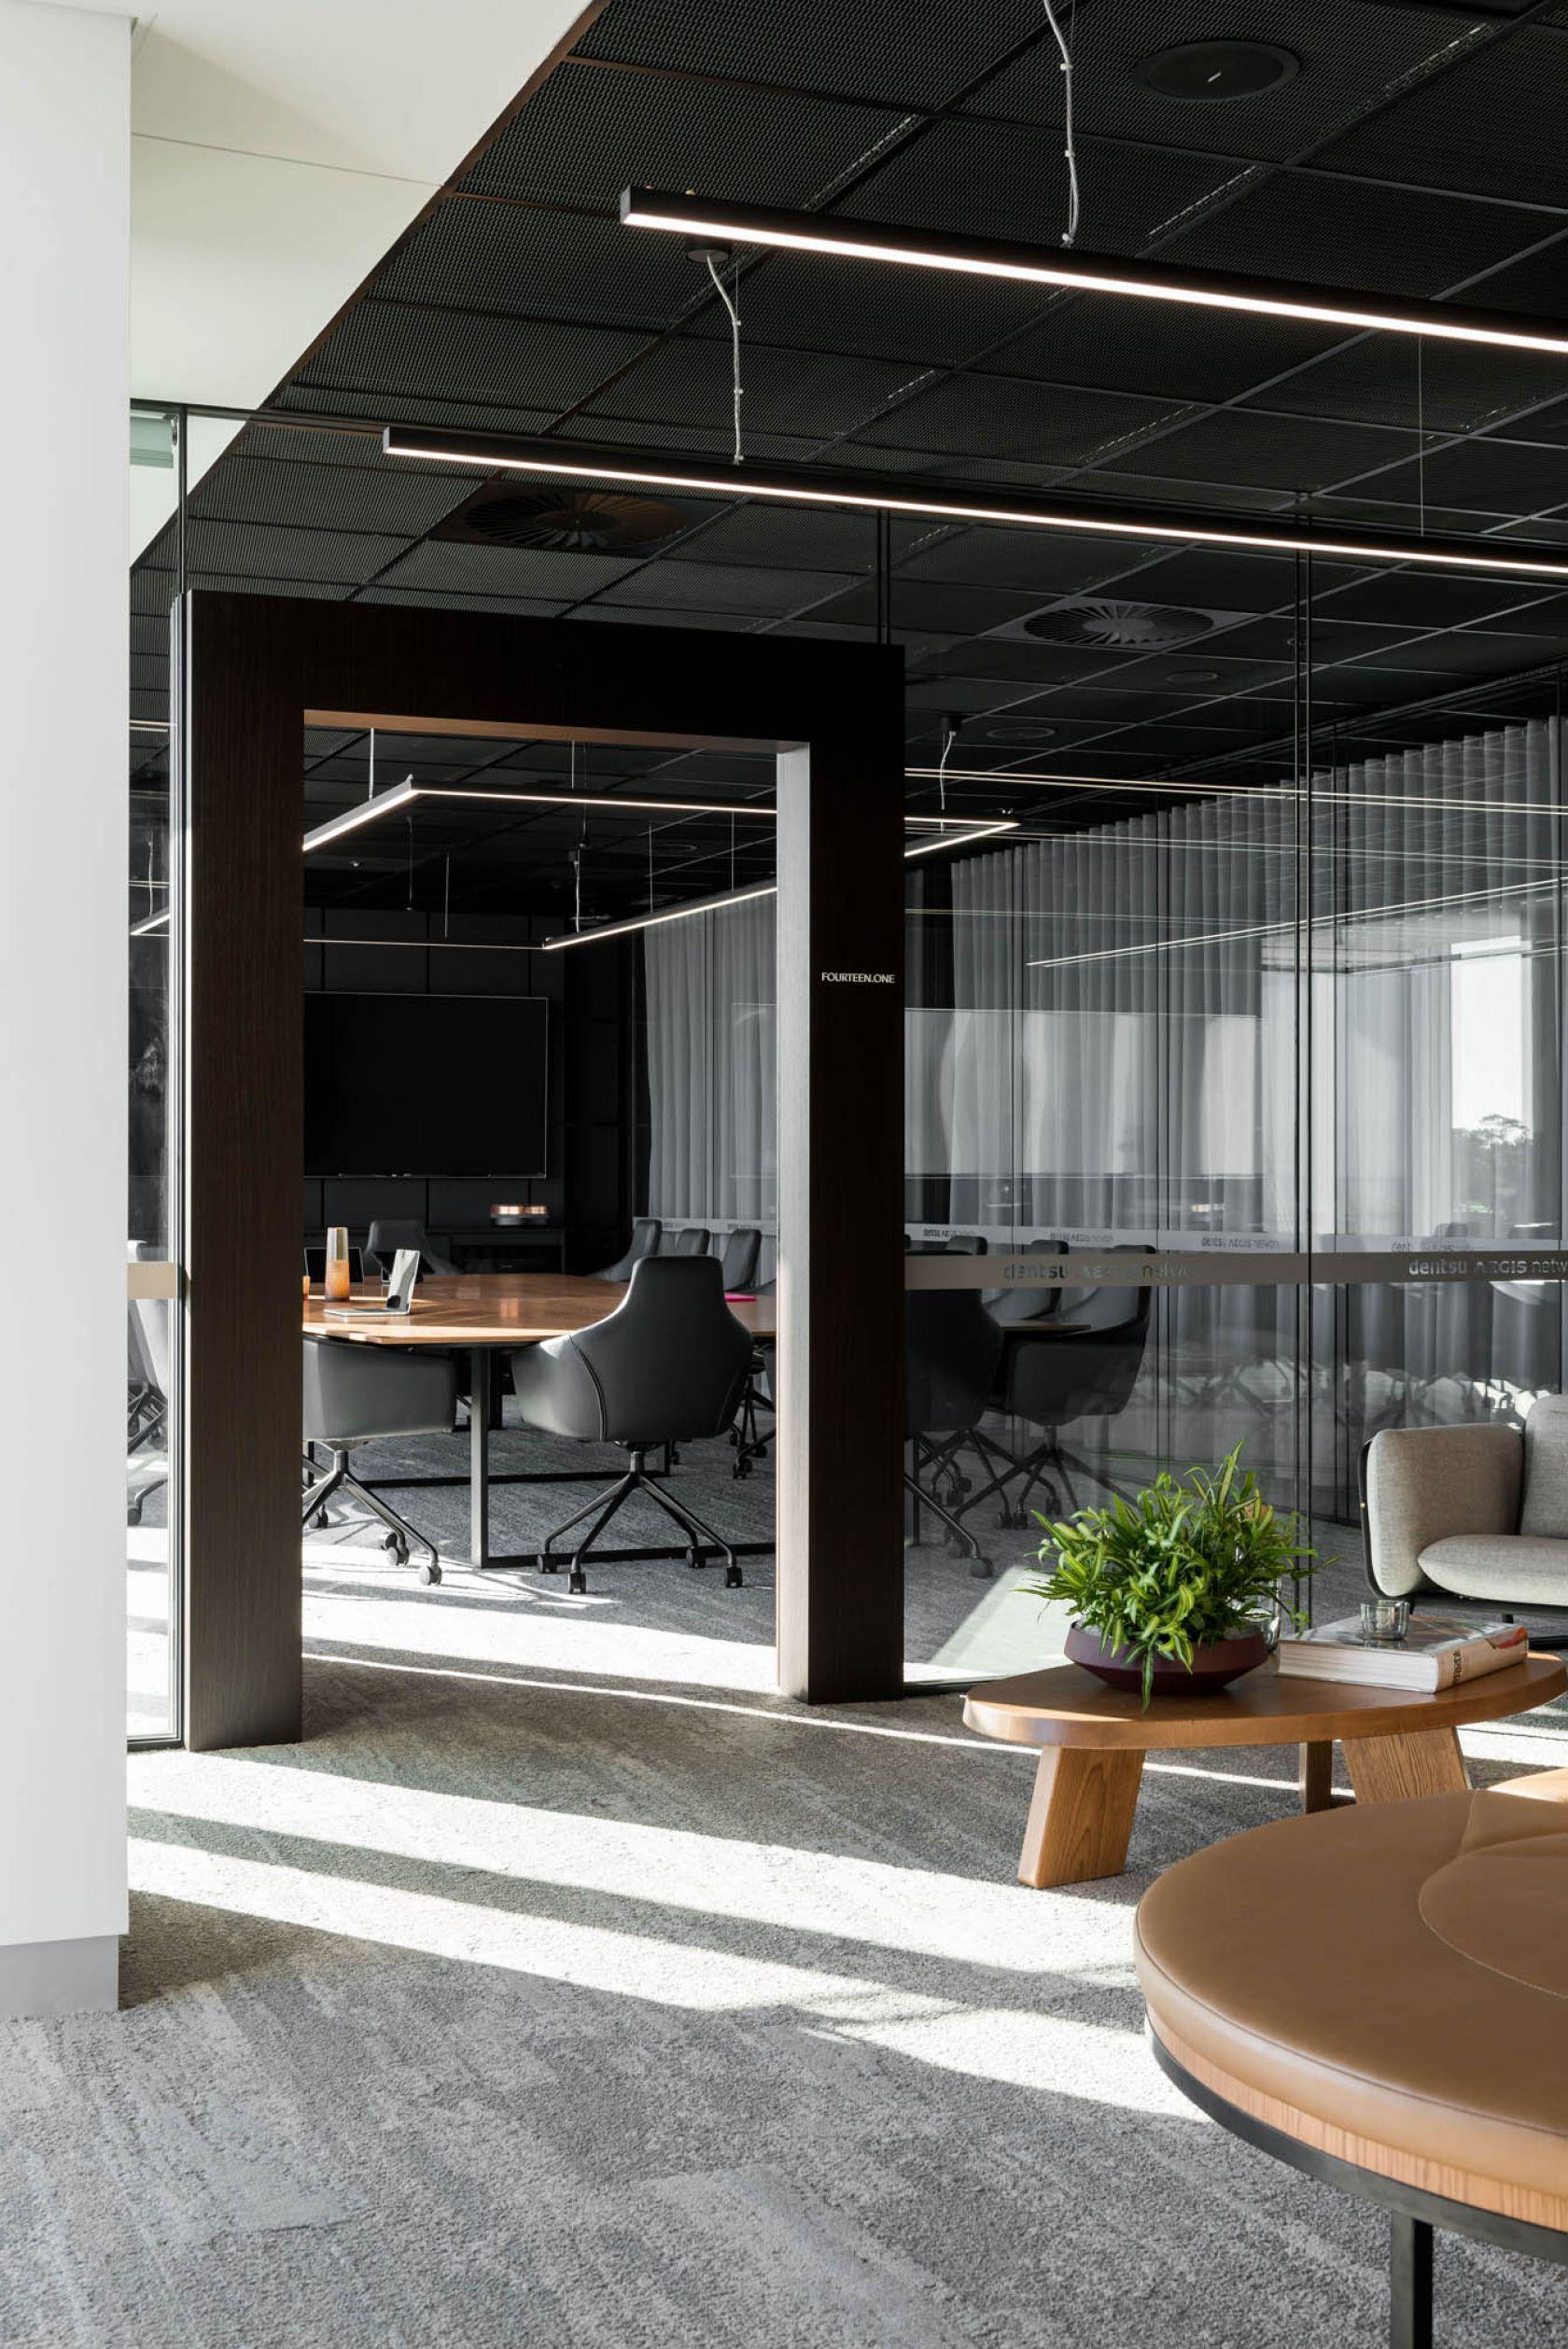 Schiavello palomino chair inside dentsu aegis network board room